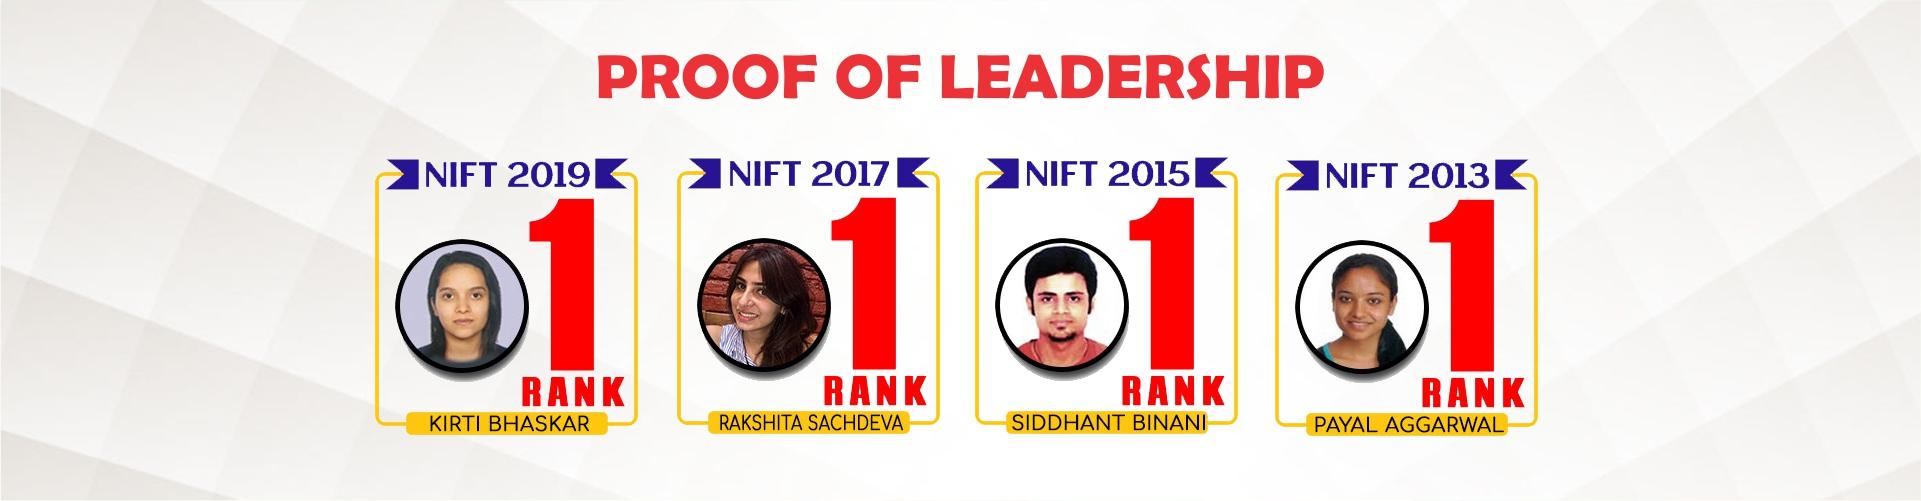 NIFT all india RANK